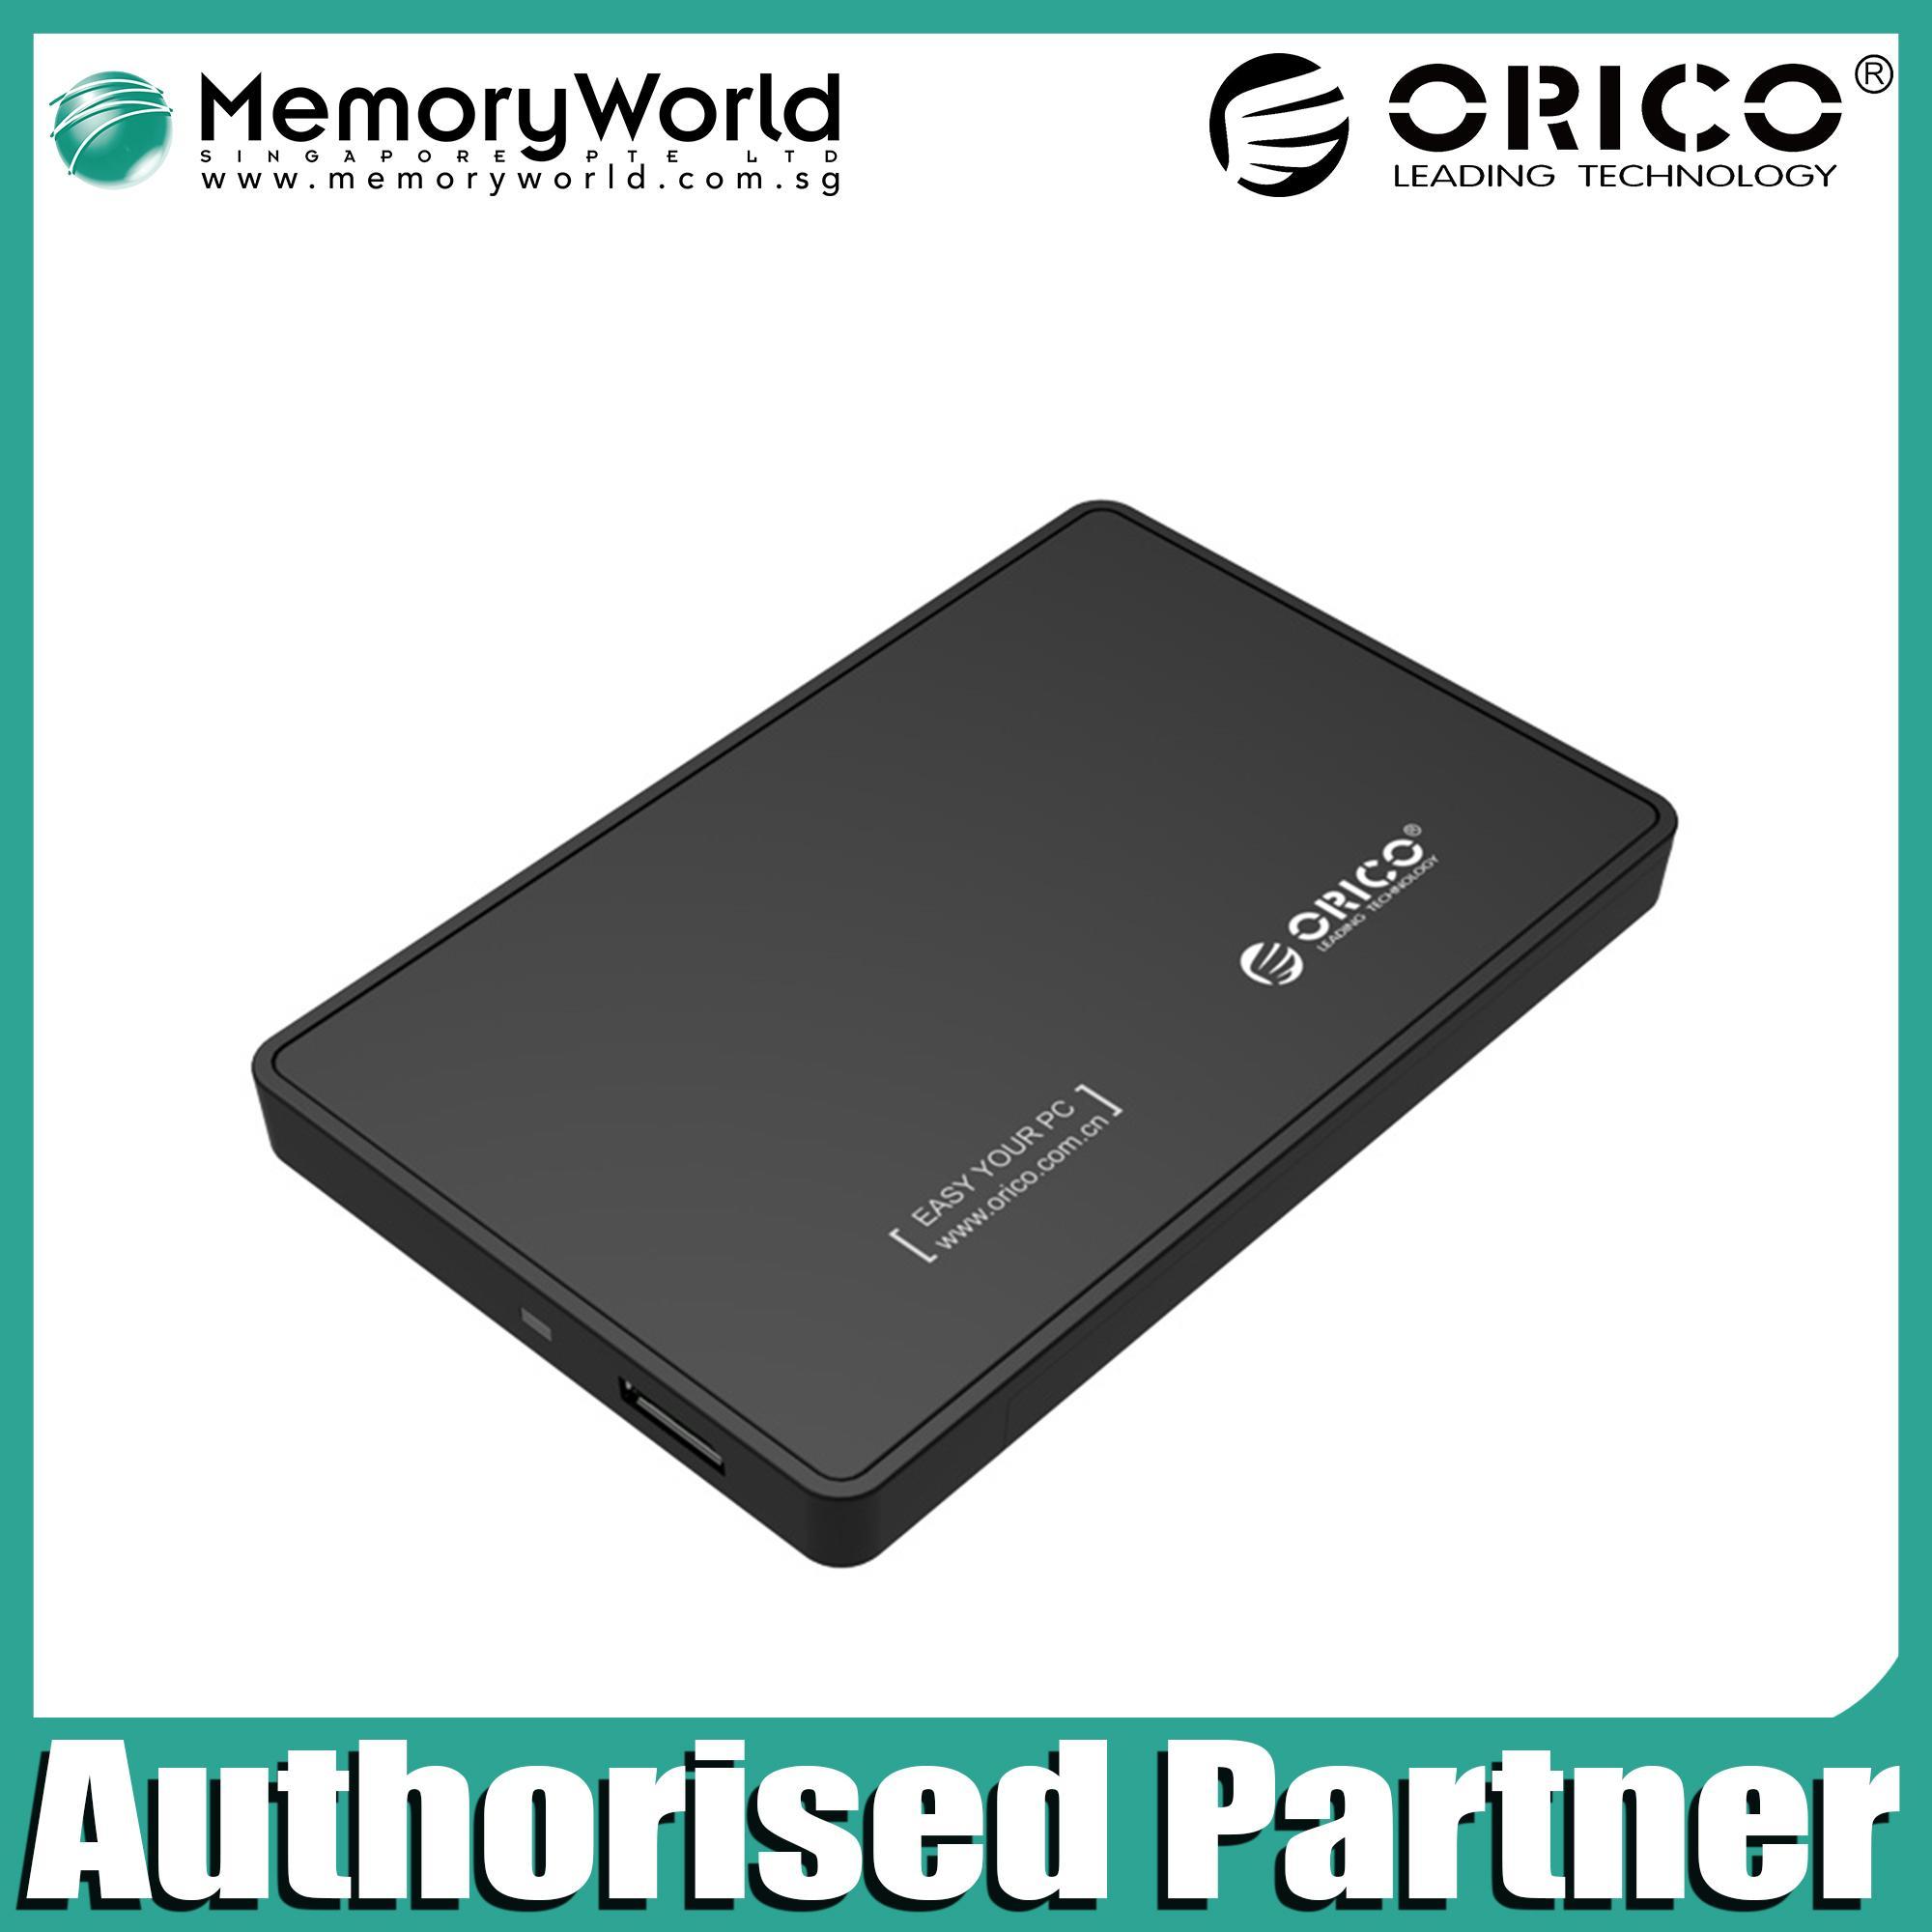 Latest Orico External Hard Drives Products Enjoy Huge Discounts 1 Bay 25 Inch Hdd Enclosure Sata 2 Usb 30 2599us3 V1 Casing Hardisk Usb30 Drive 2588us3